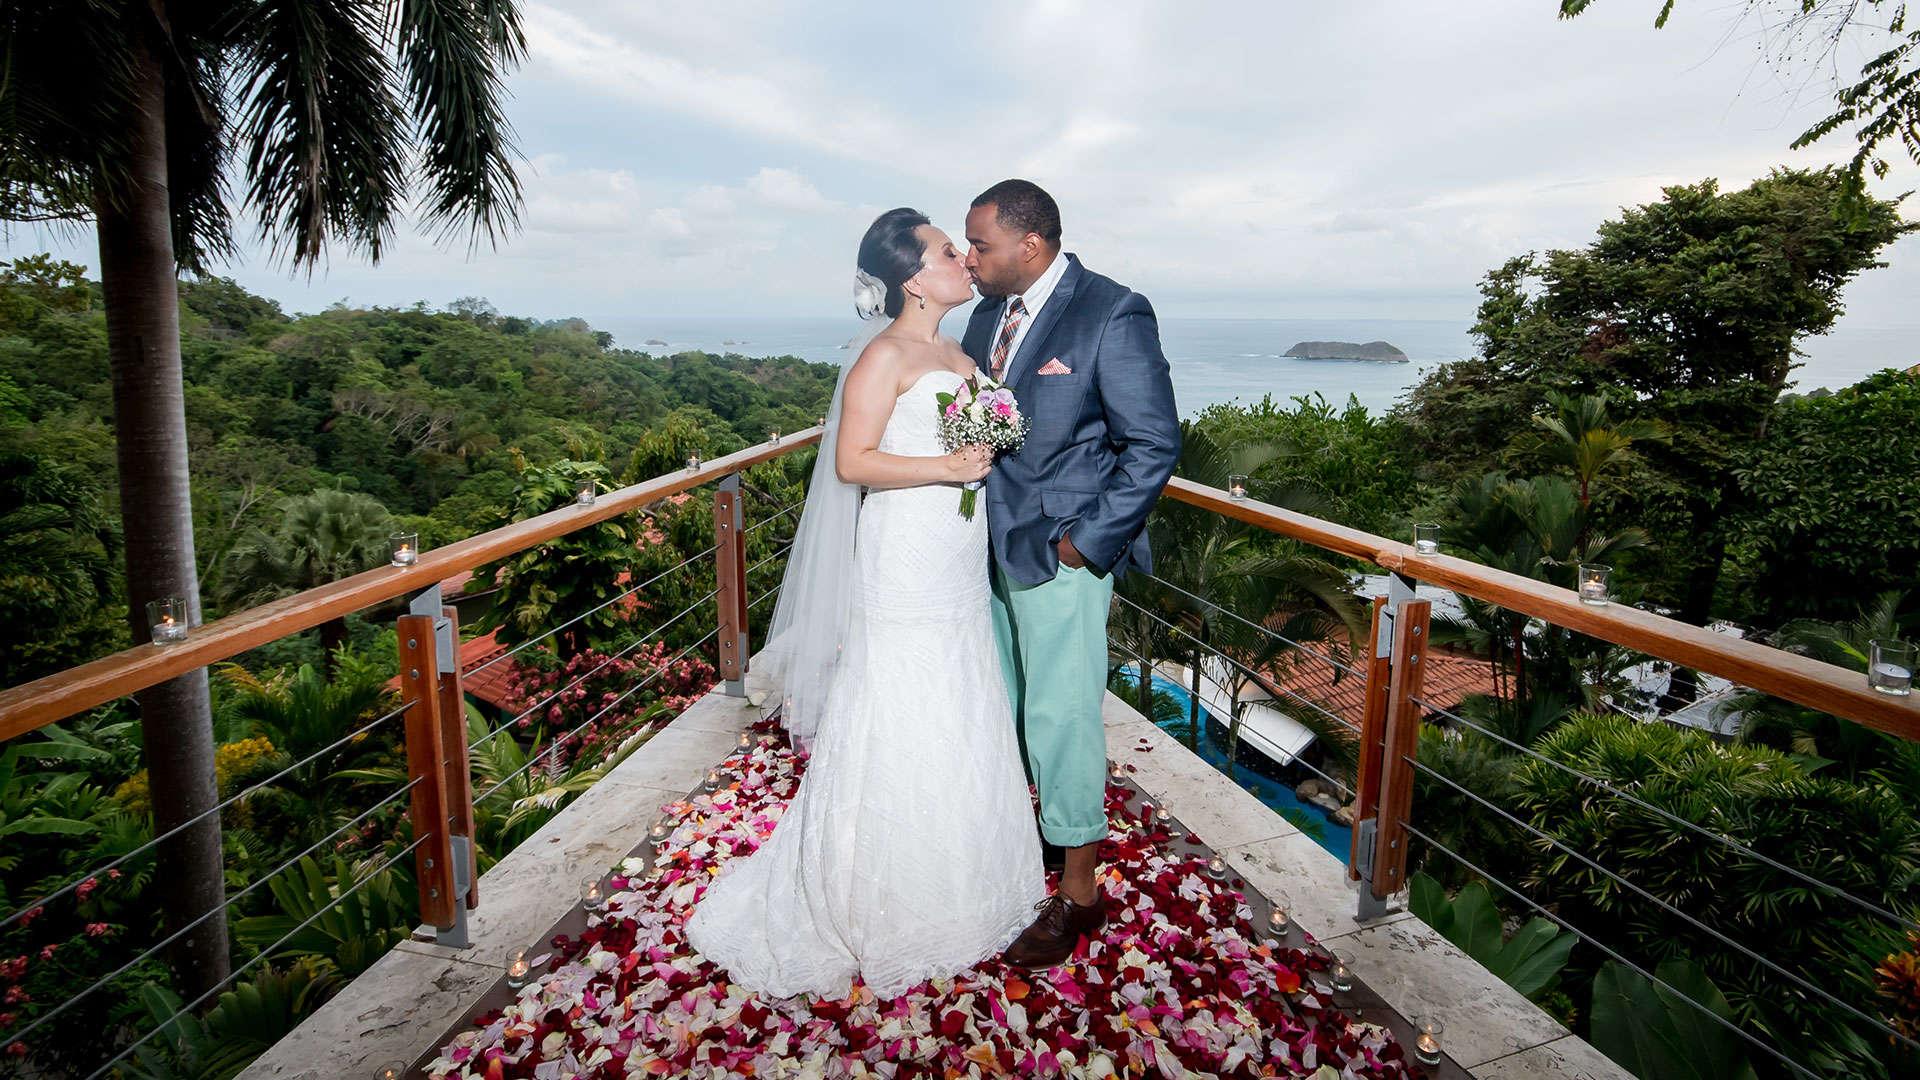 Costa rica honeymoon wedding packages greentique for Weddings in costa rica